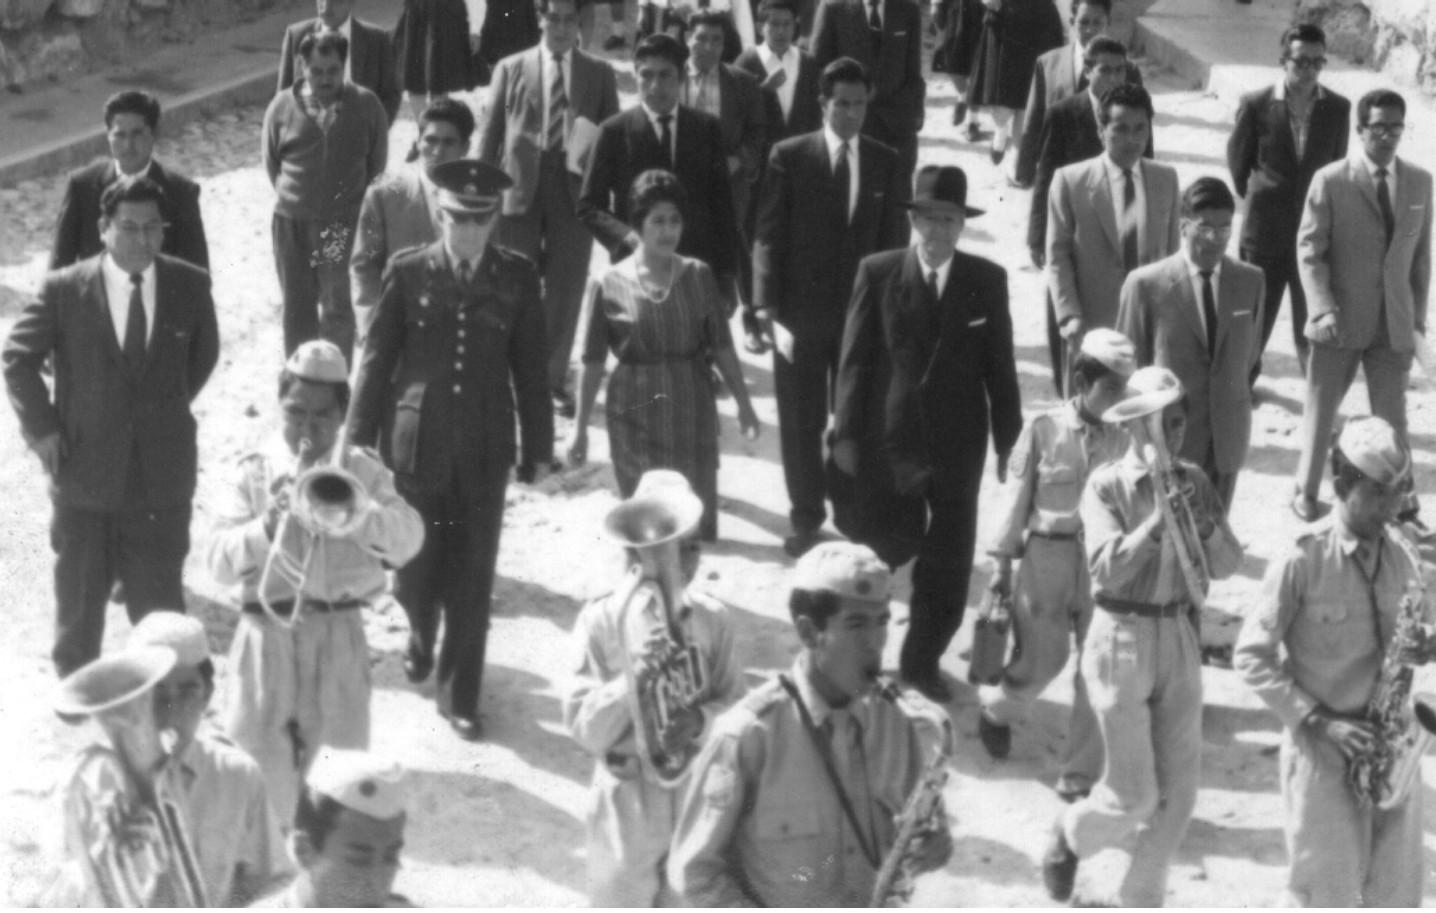 ENTREGA TERRENO 1963